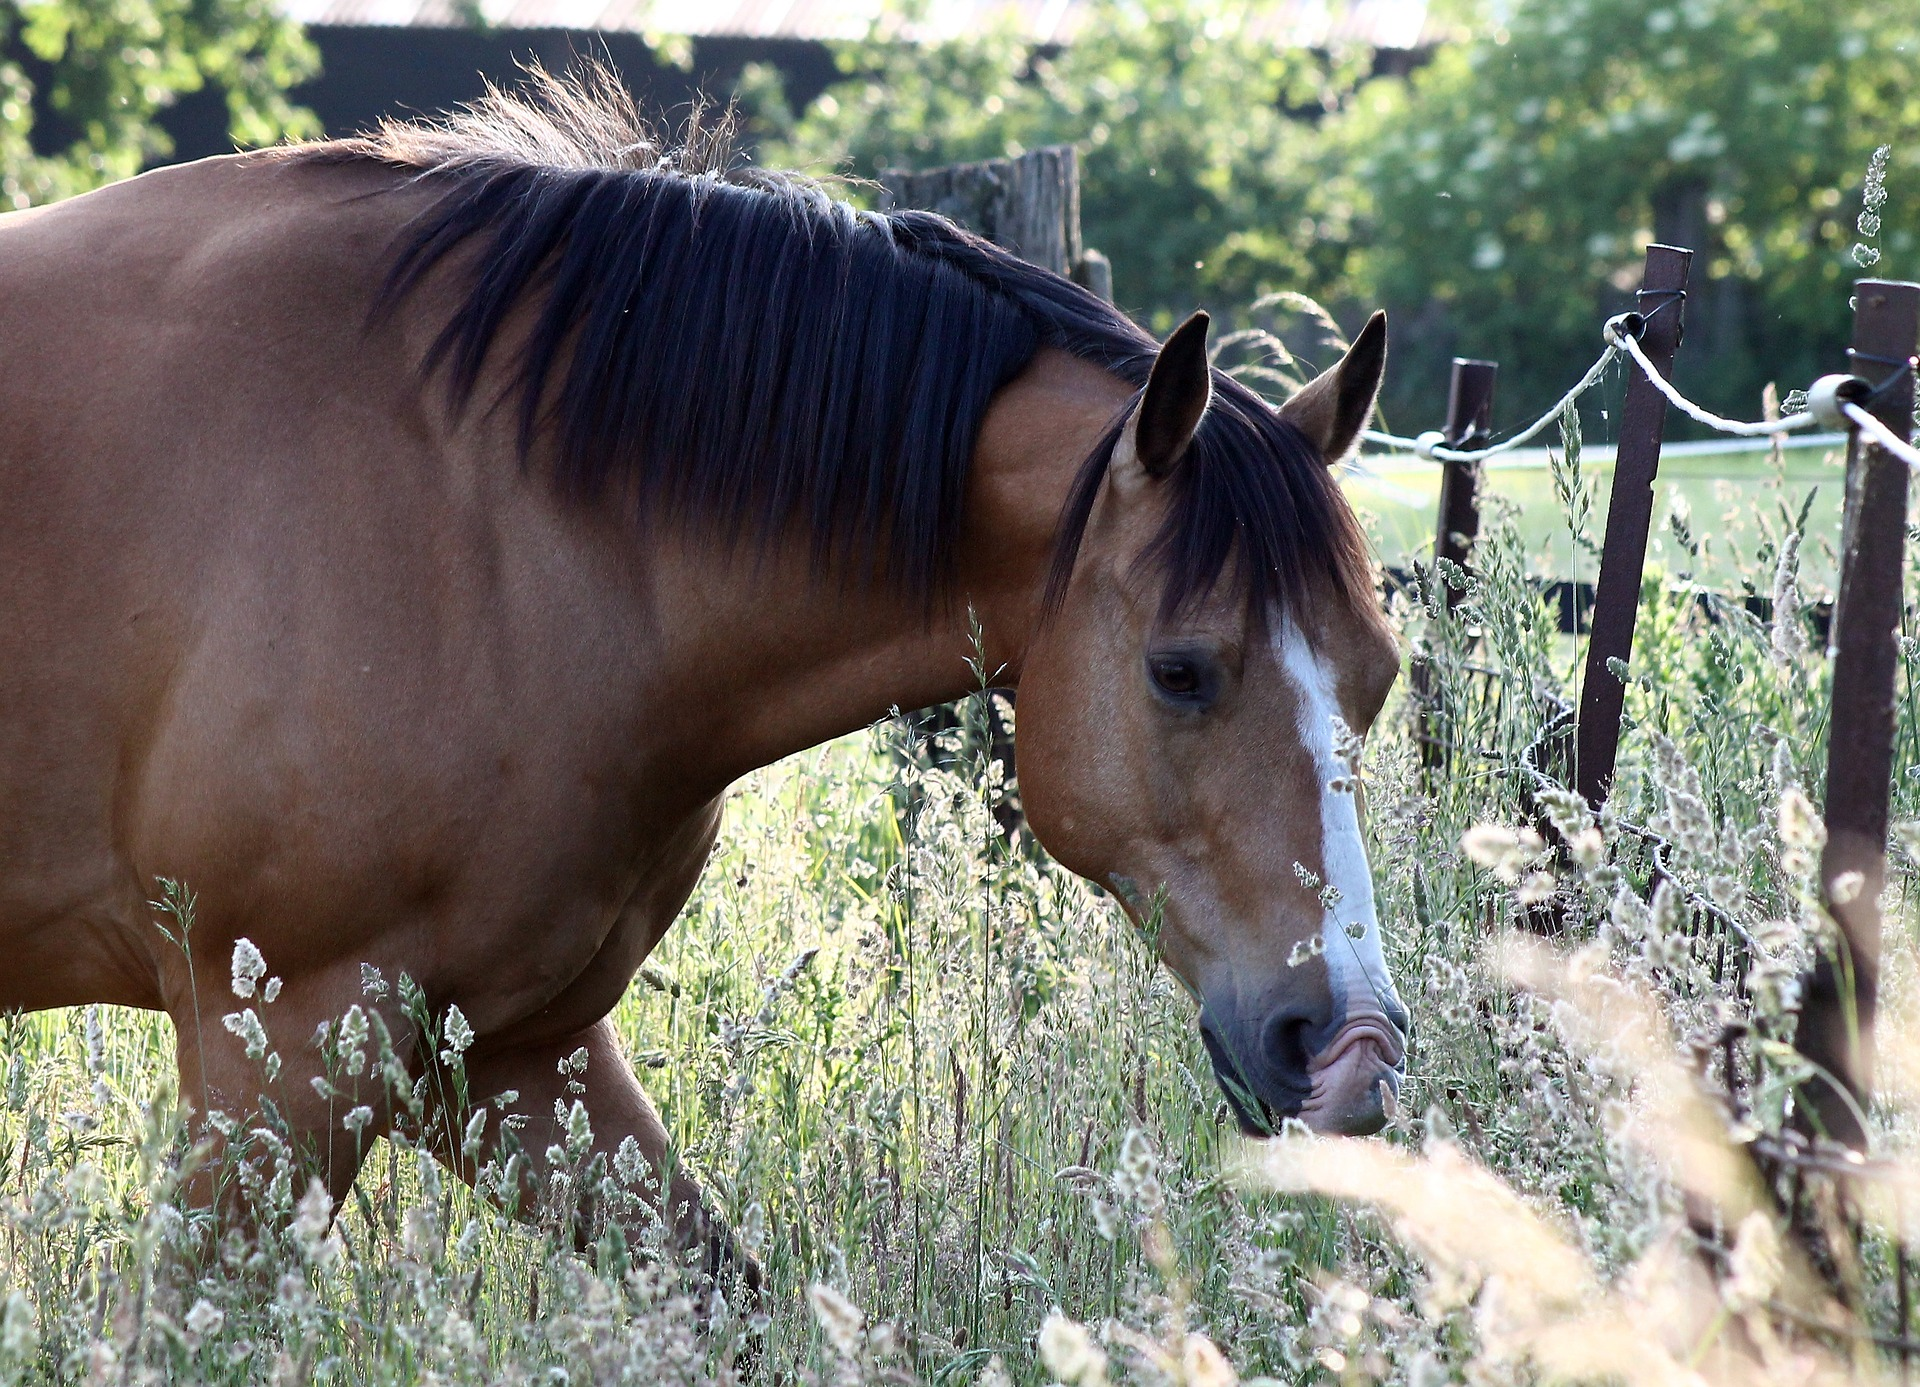 horse-2759673_1920.jpg